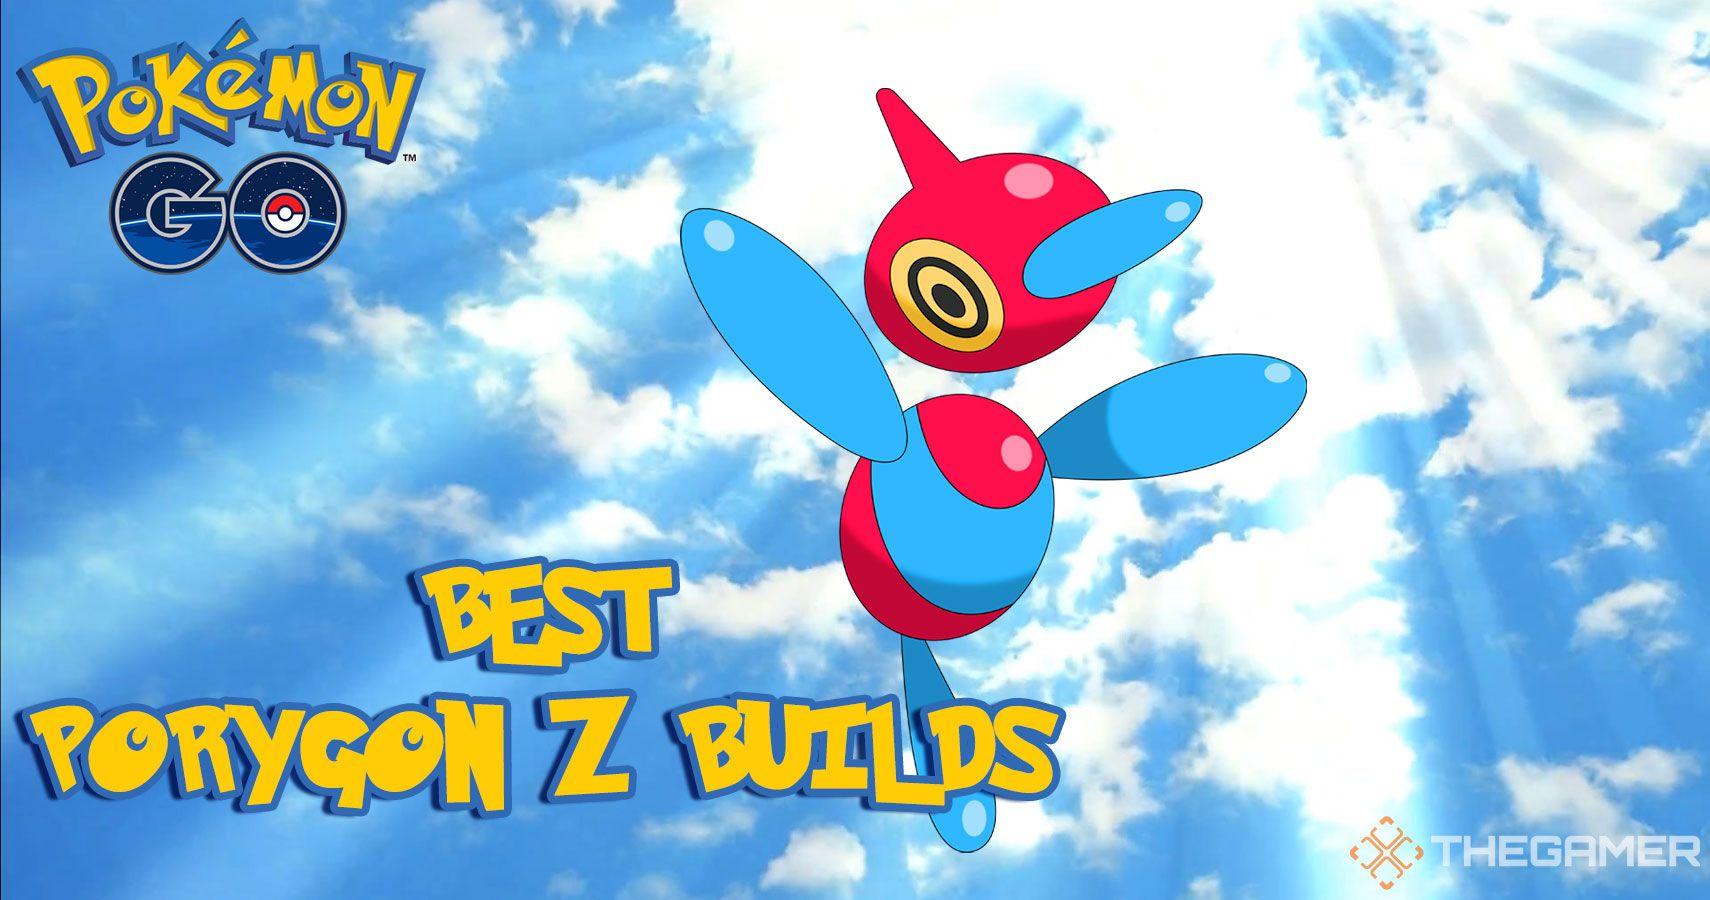 Pokemon GO: Best Porygon Z Builds